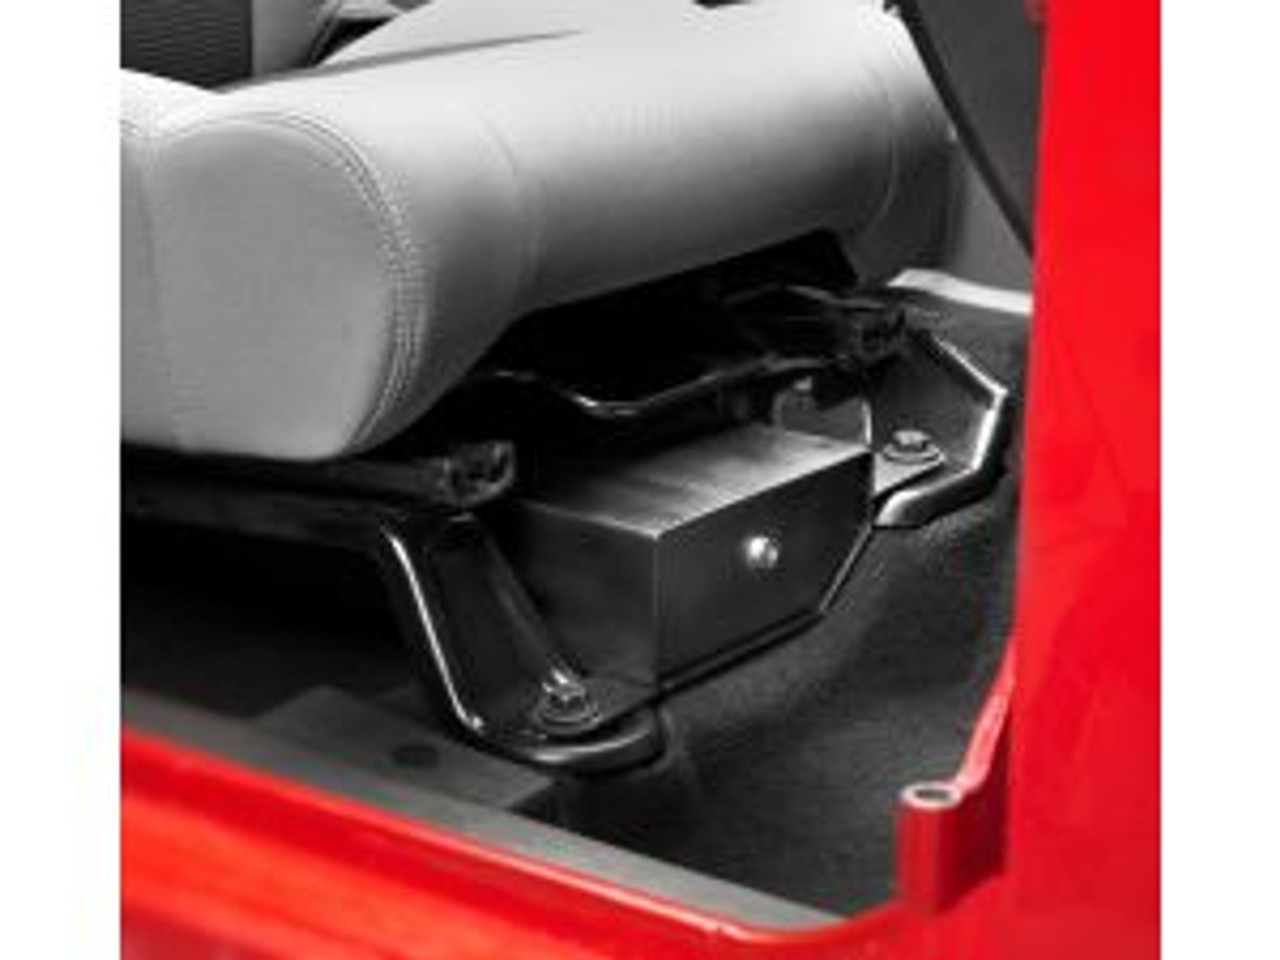 Bestop Locking Storage Box for Jeep JK